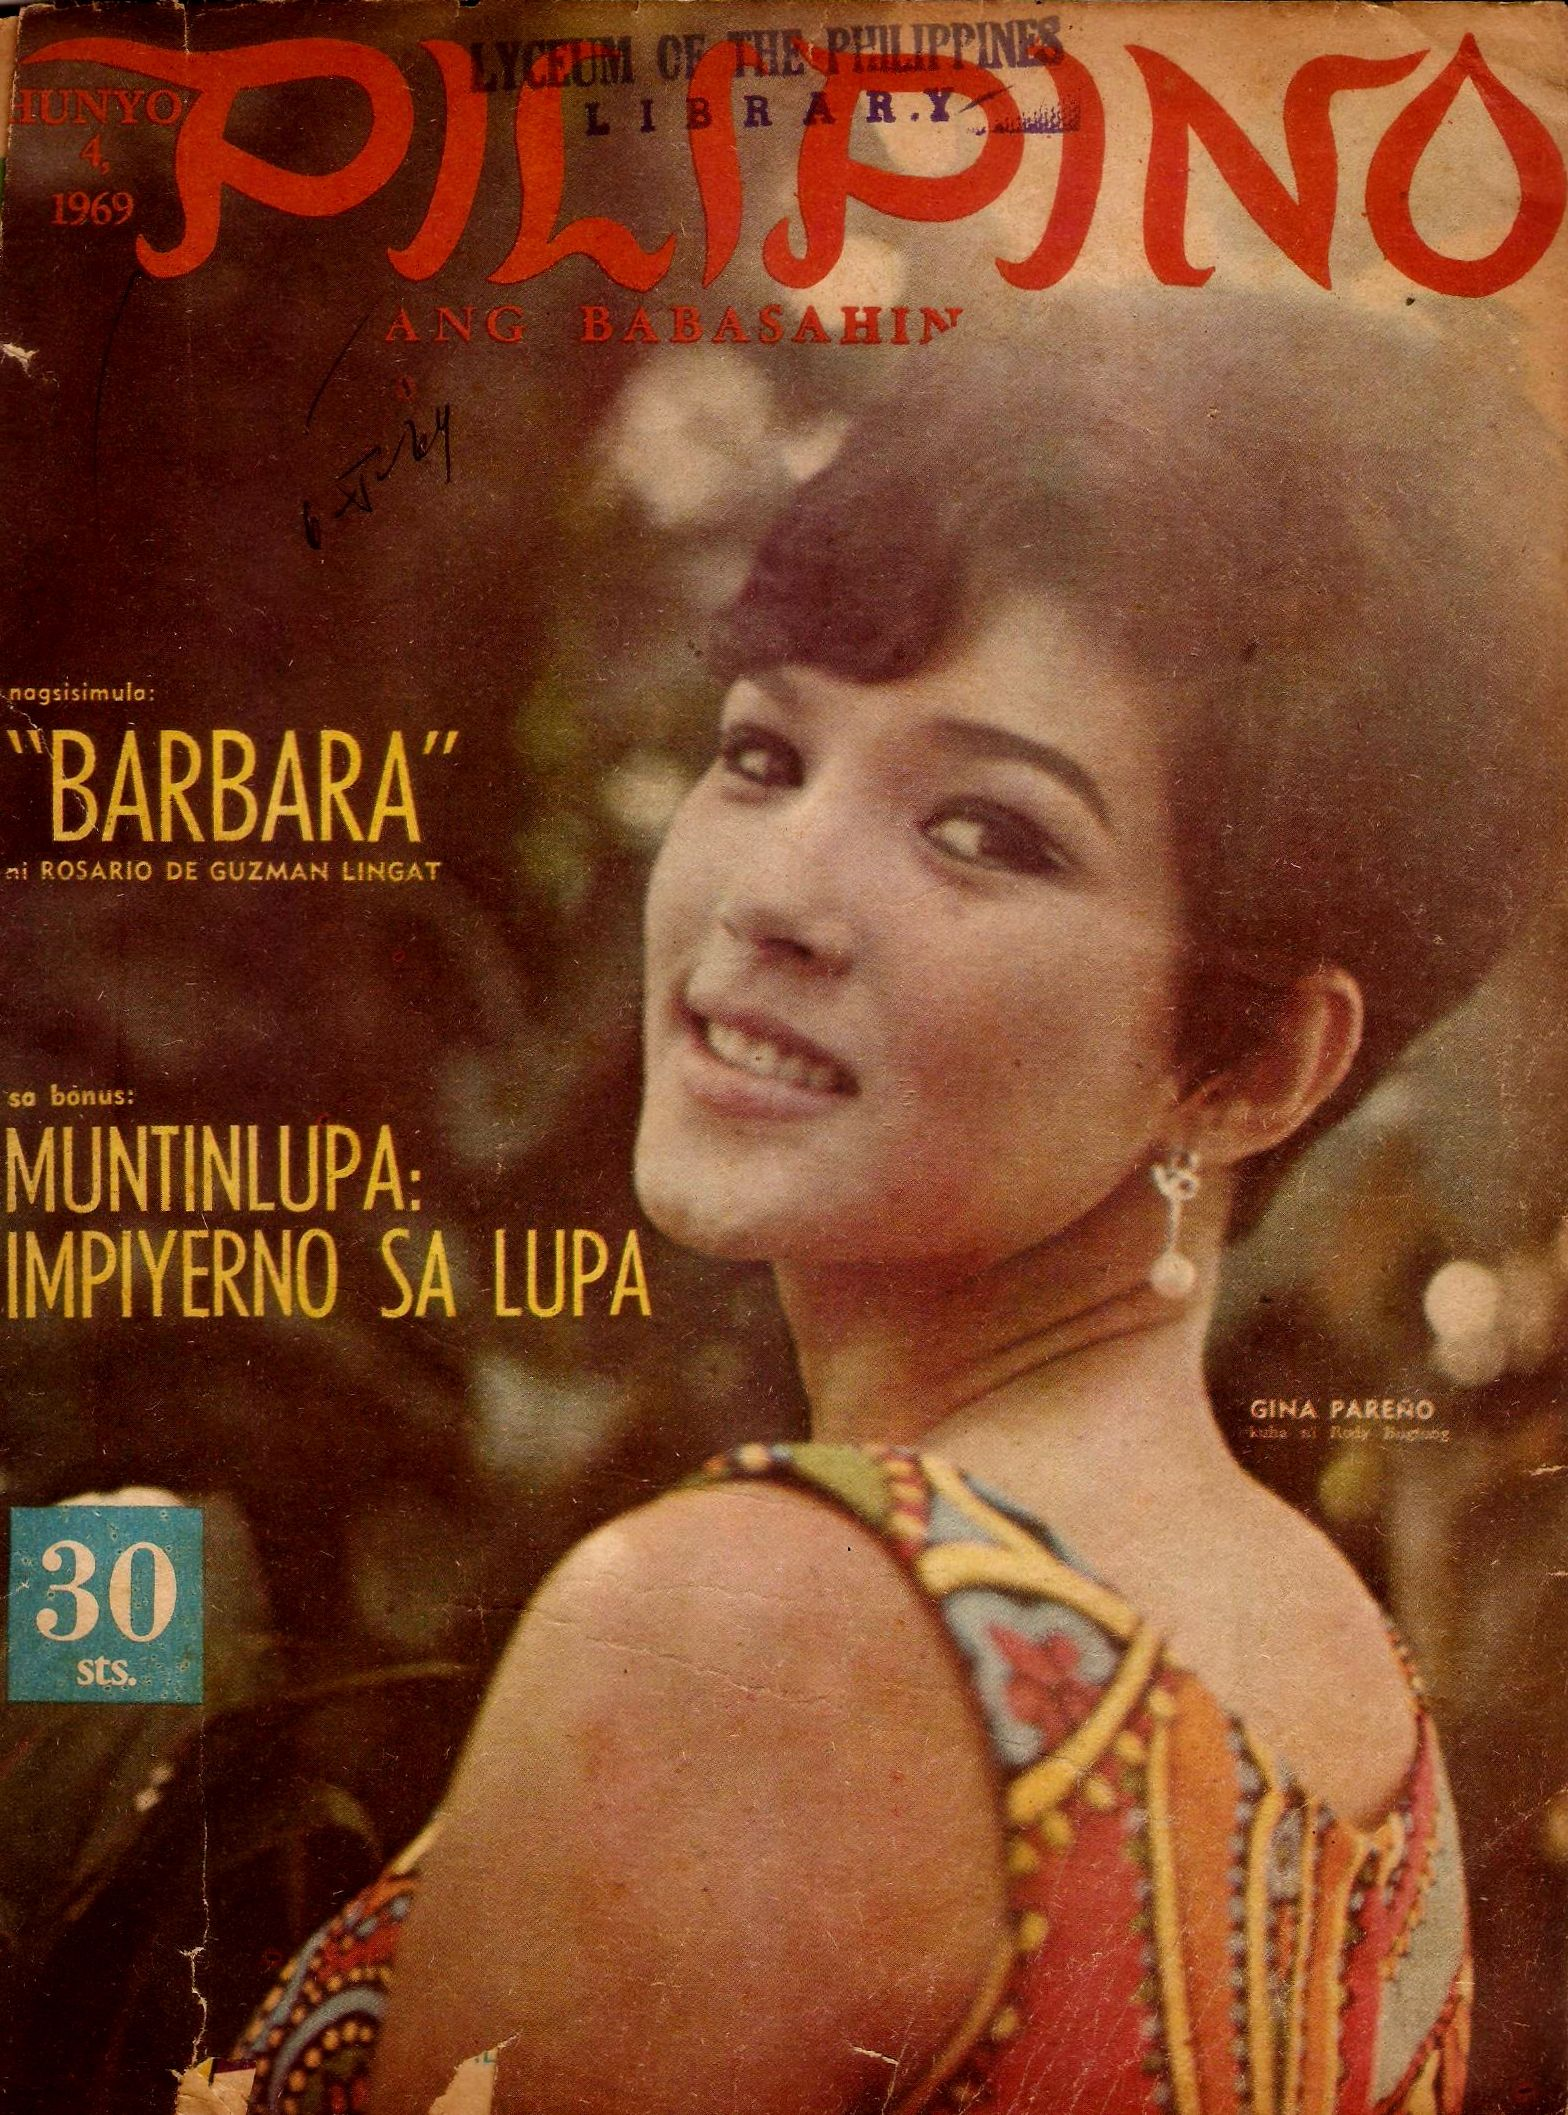 Gina Pareno (b. 1949)